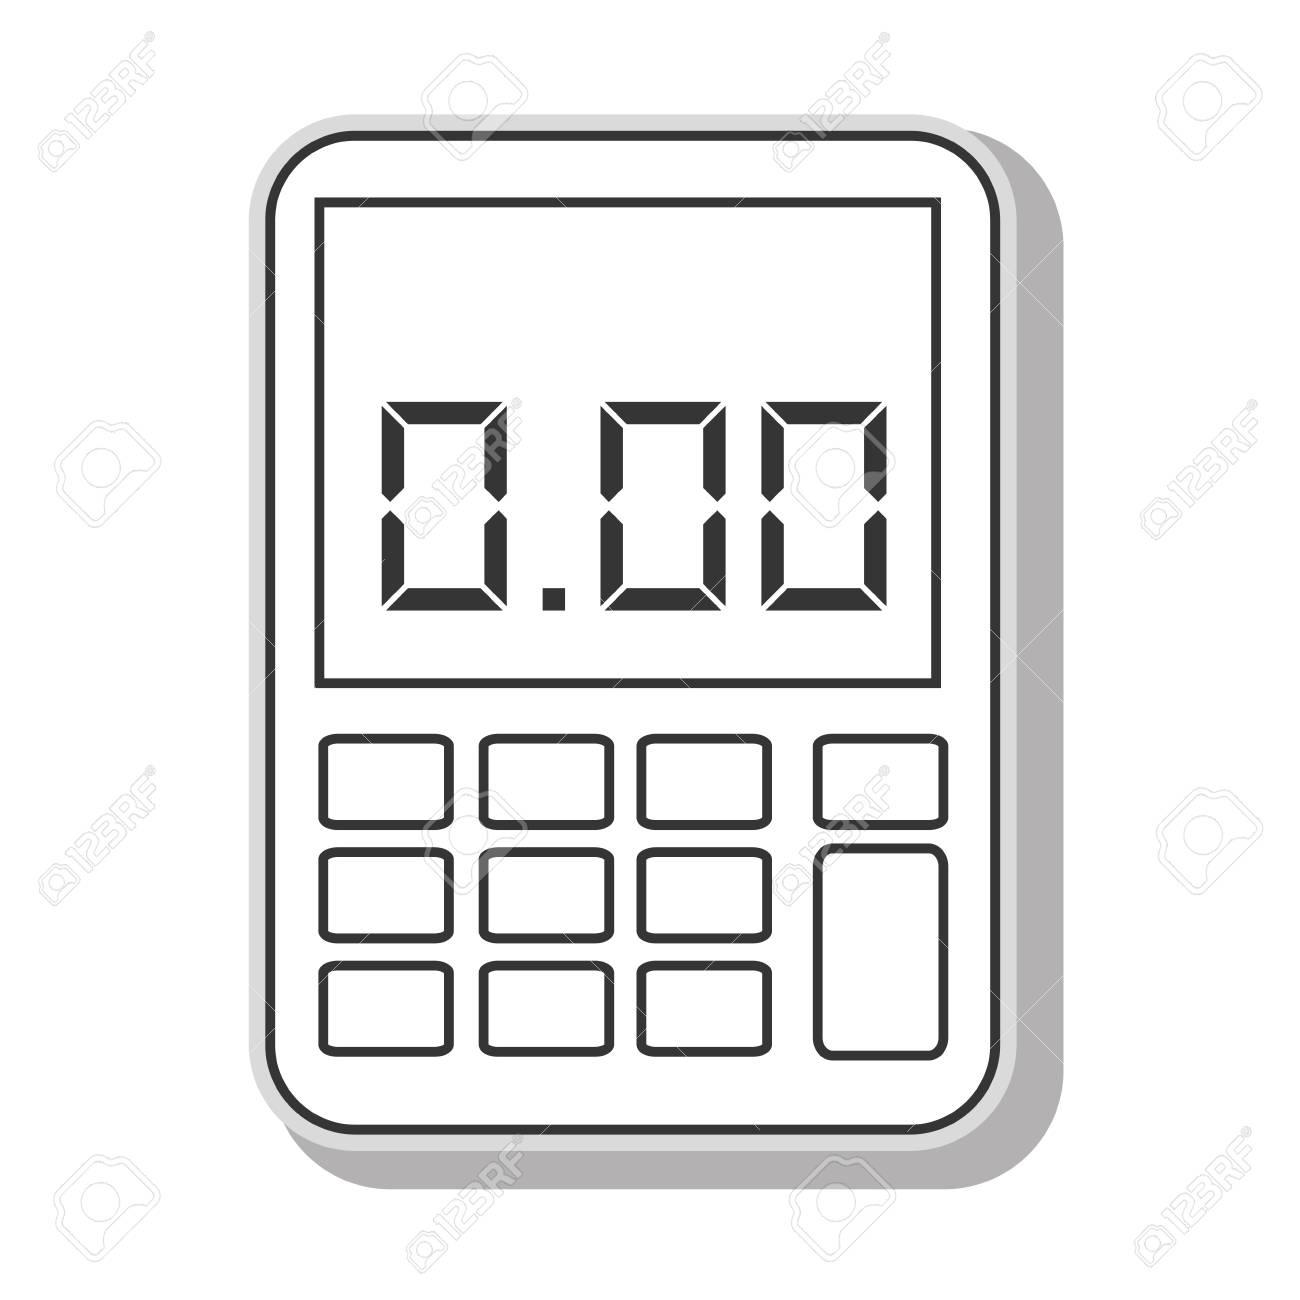 Using the math key on the ti-83.